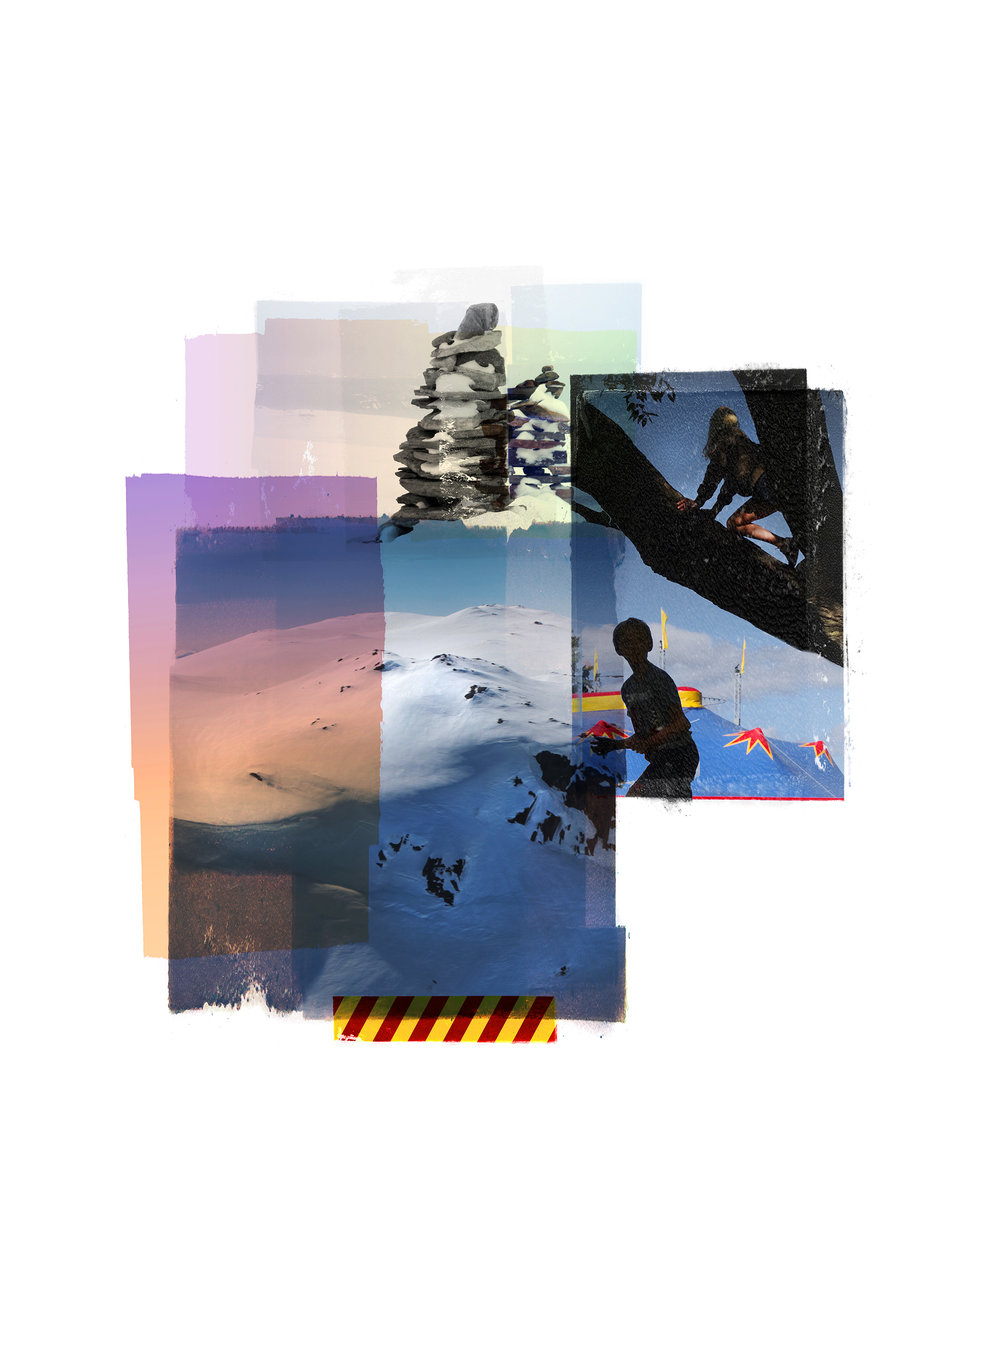 Climbers / Reservoir / Circus   Original Archival UV Pigment Print / BFK Rives 250 gr 25 x 35 cm / 18,5 x 13,7 in Edition of 50 + 5 A Editeur: Per Fronth Studios / Printer Henrik Aunevik  Commission: BI Norwegian Business School  10/2017: